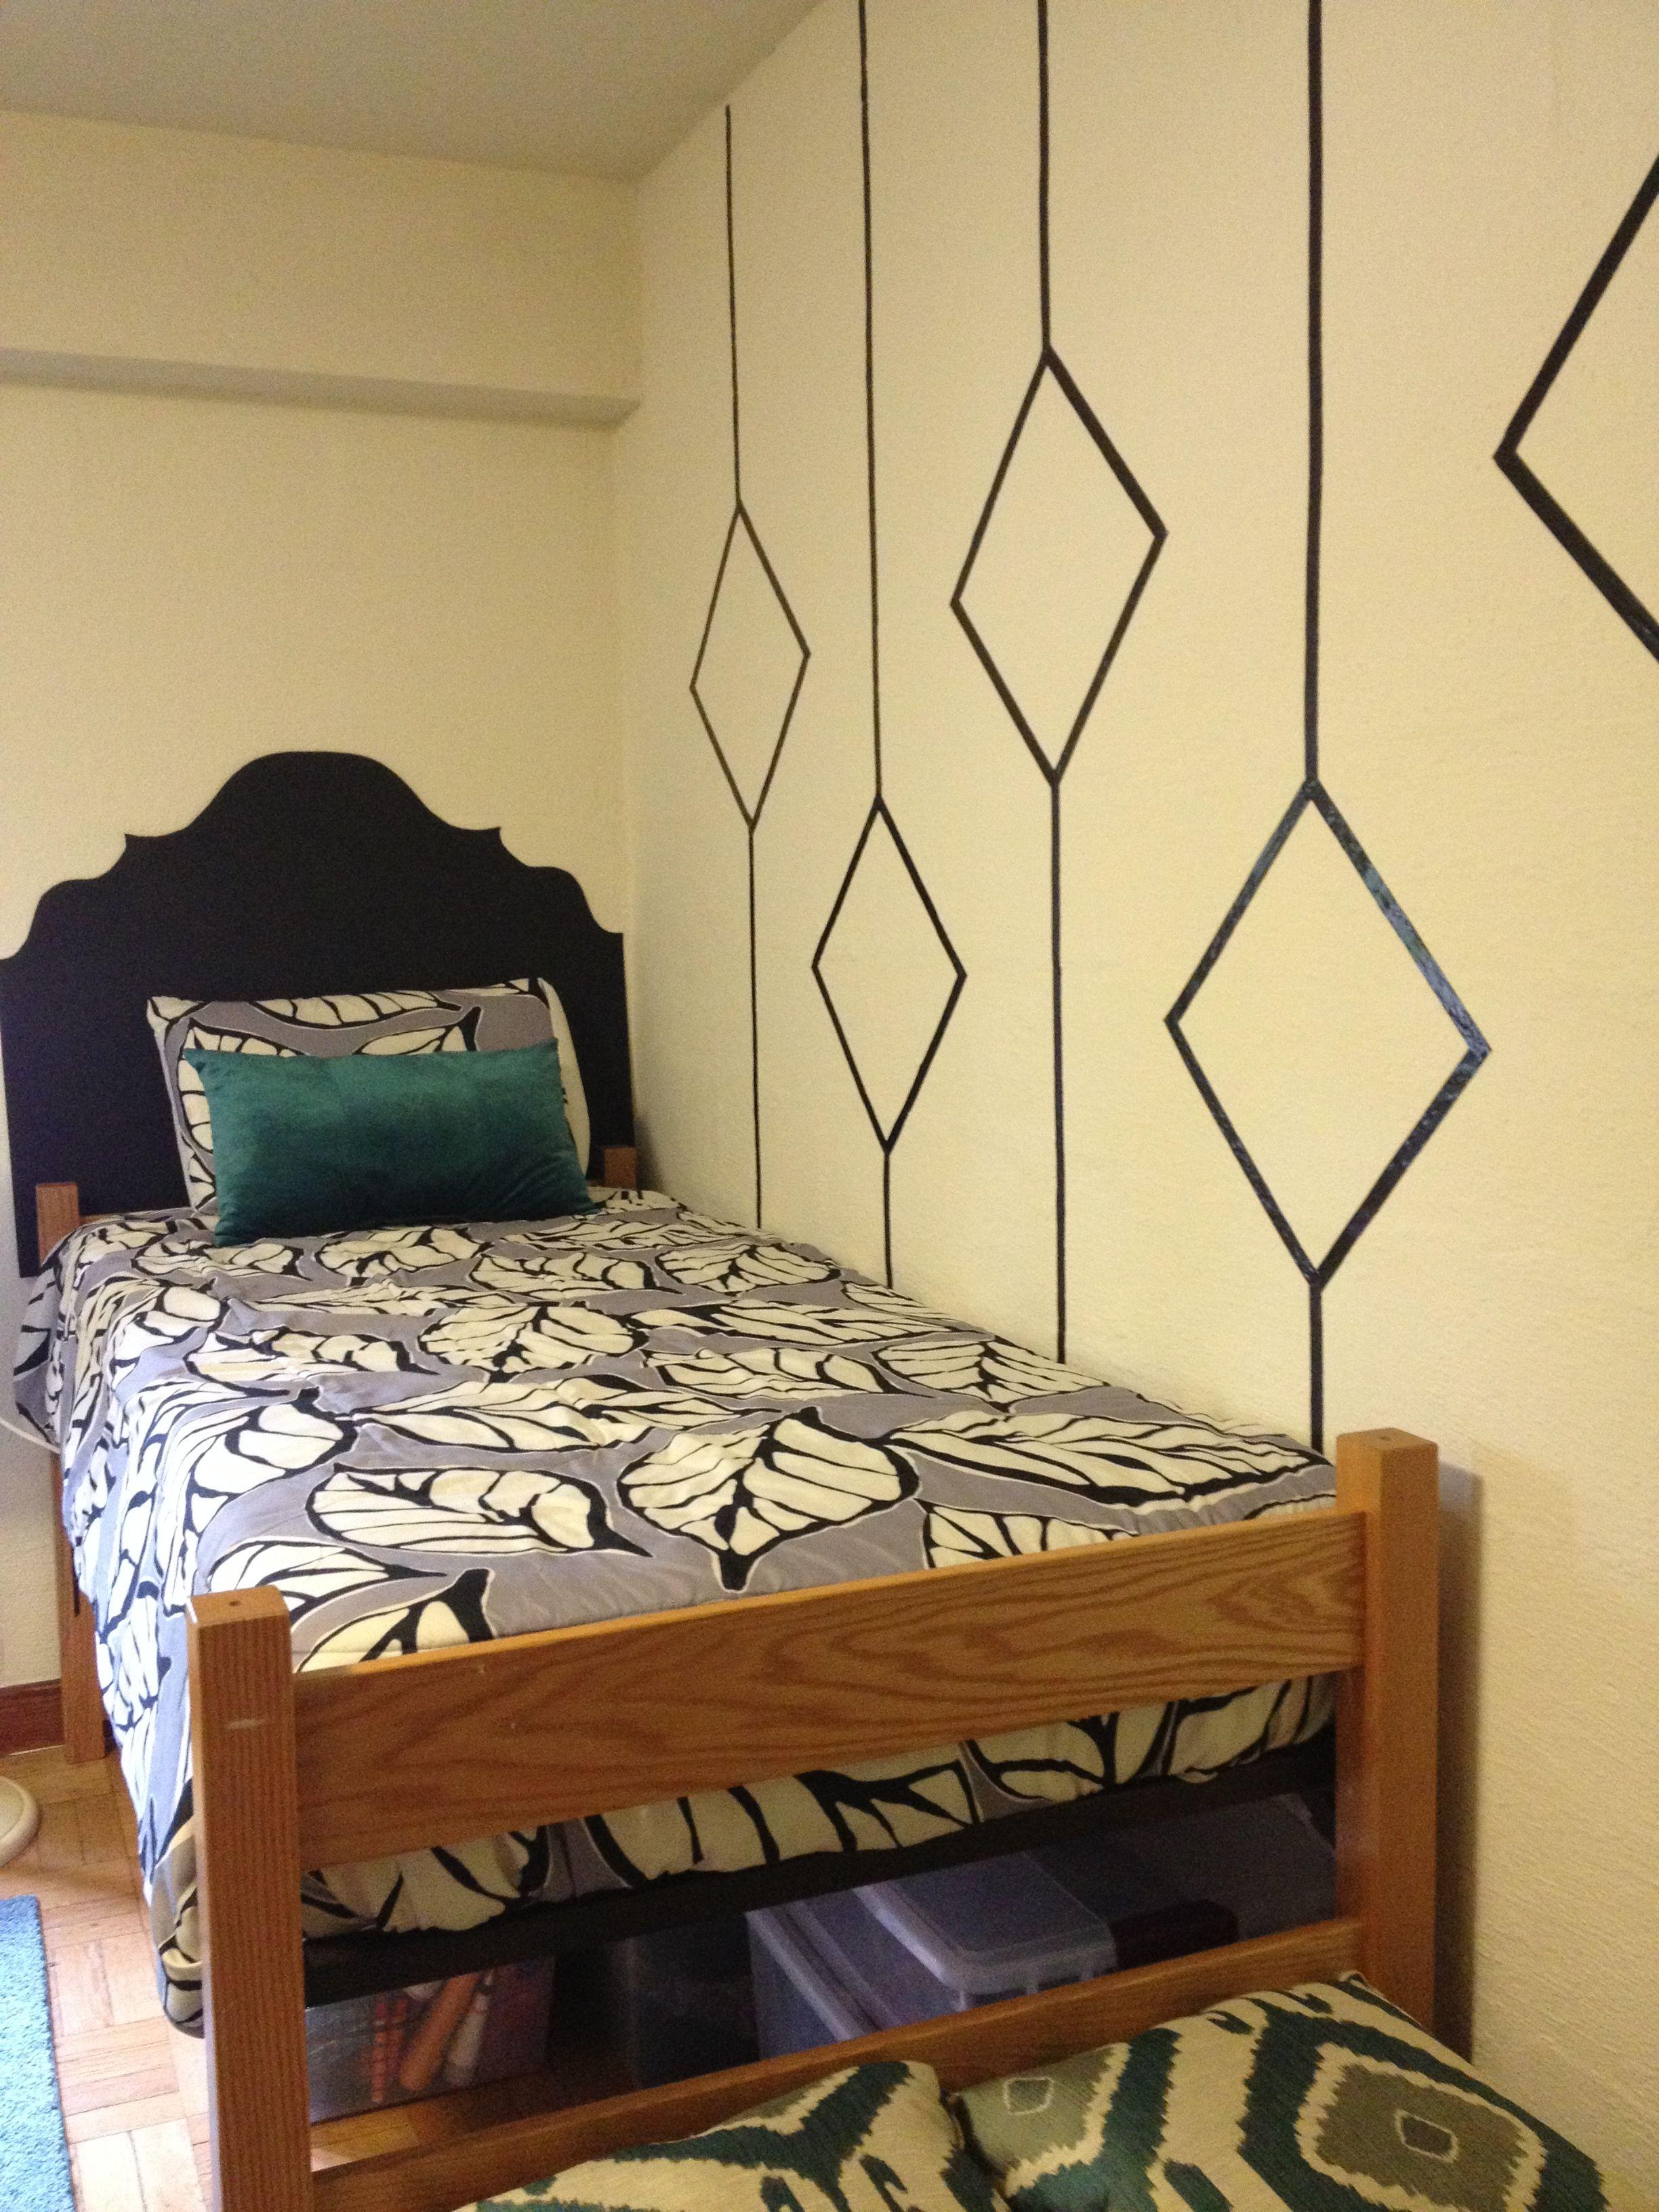 Dorm Wall Decorations On Pinterest Dorm Shelves Photo